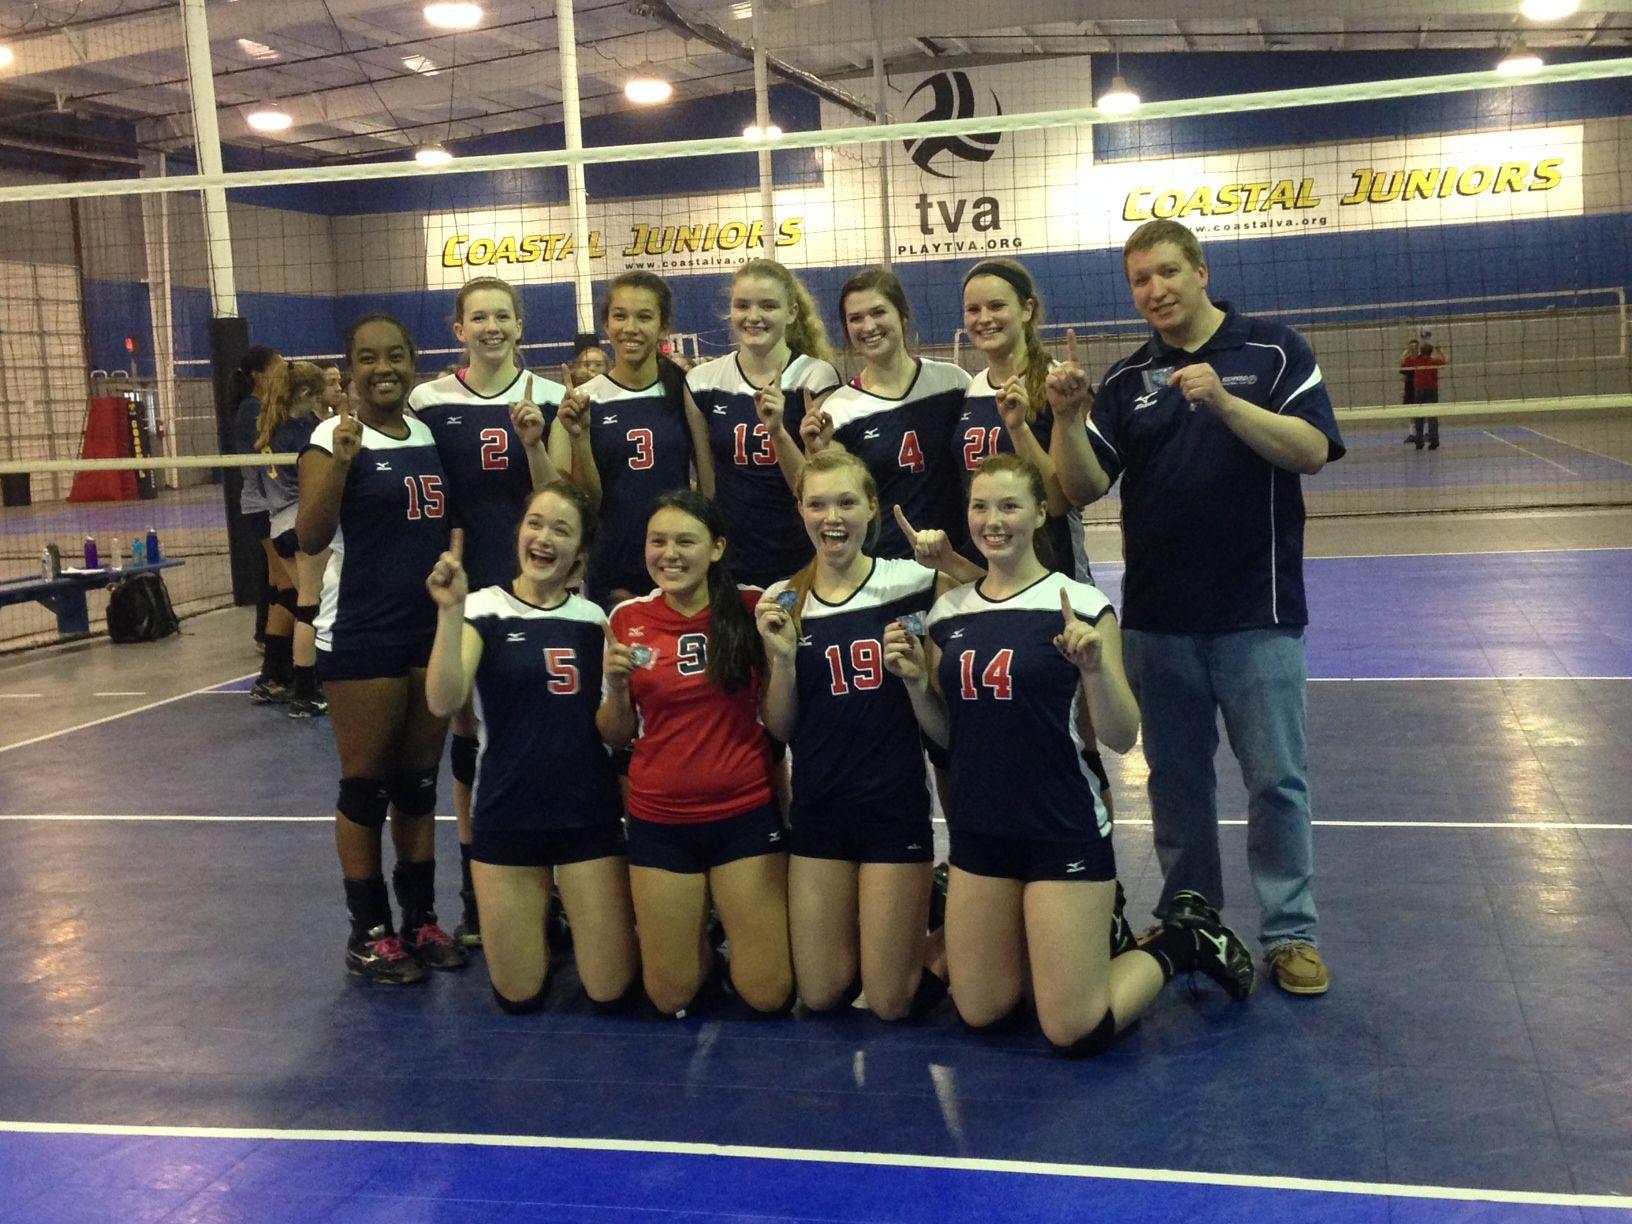 Rvc Girls 16 Zonal Win Tva Tournament 2 14 Girls 16 Volleyball Tournaments